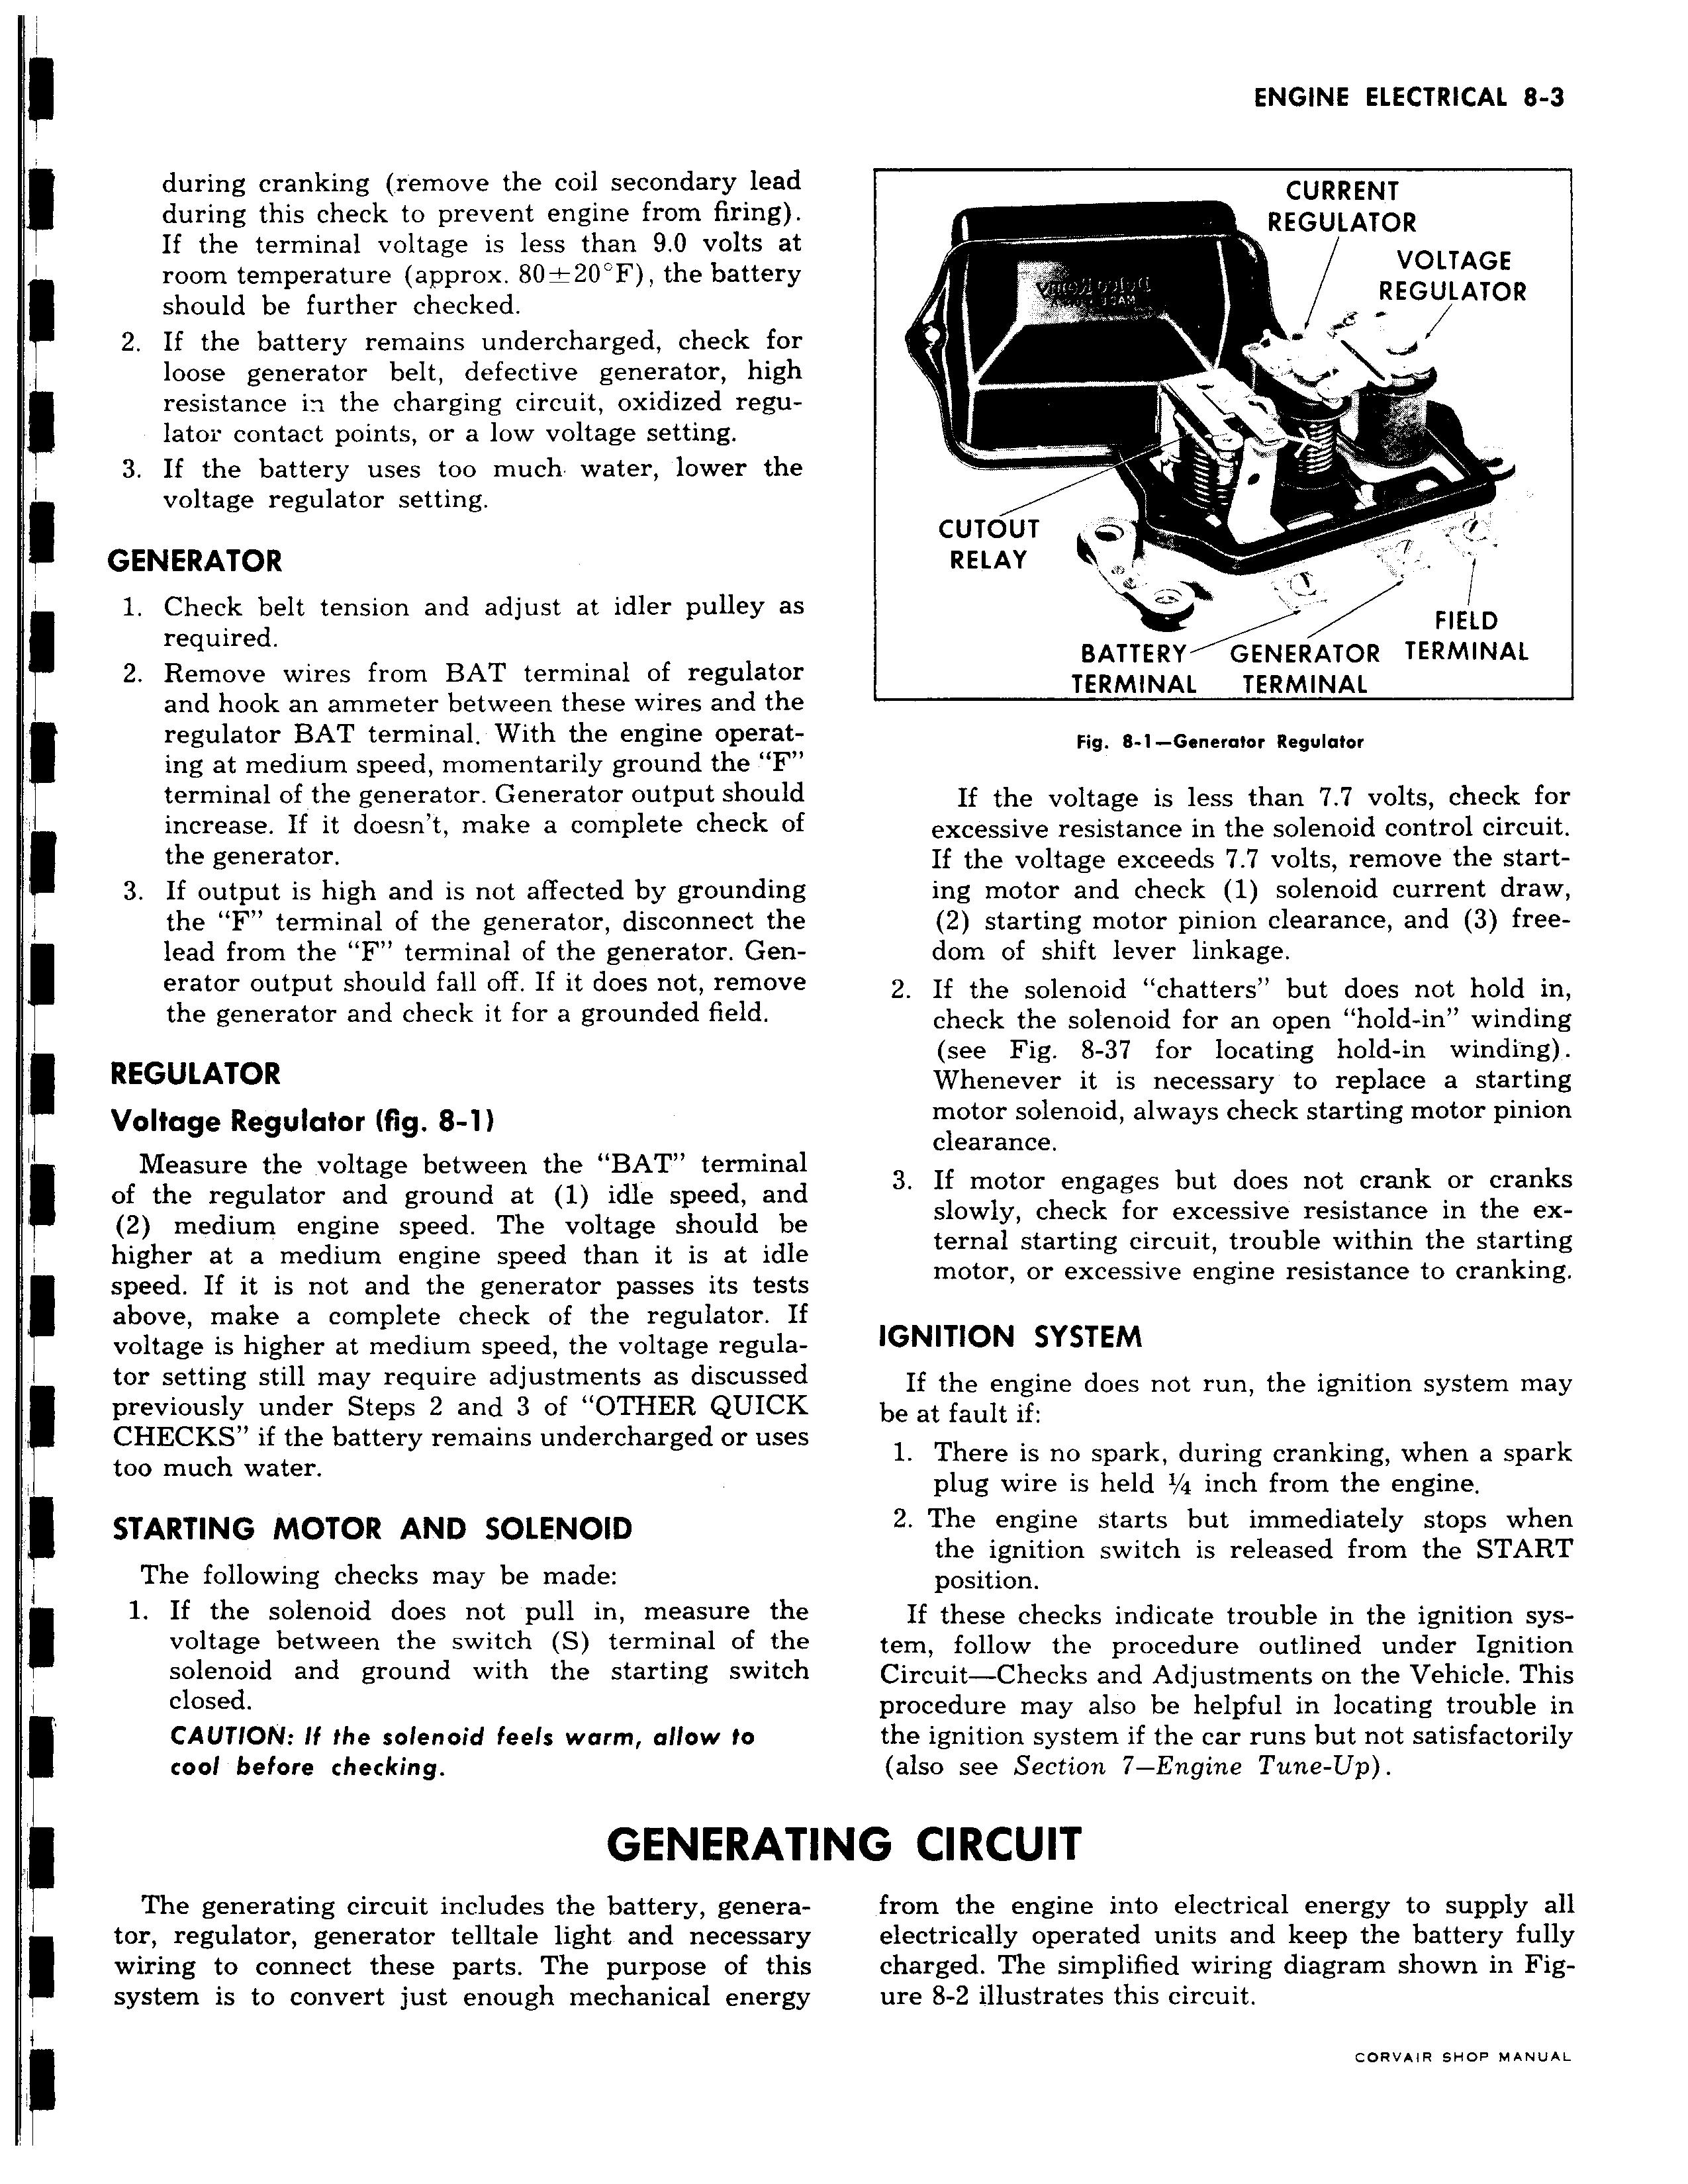 Gmpartswiki Corvair Shop Manual January 1961 3 Terminal Solenoid Wiring Diagram